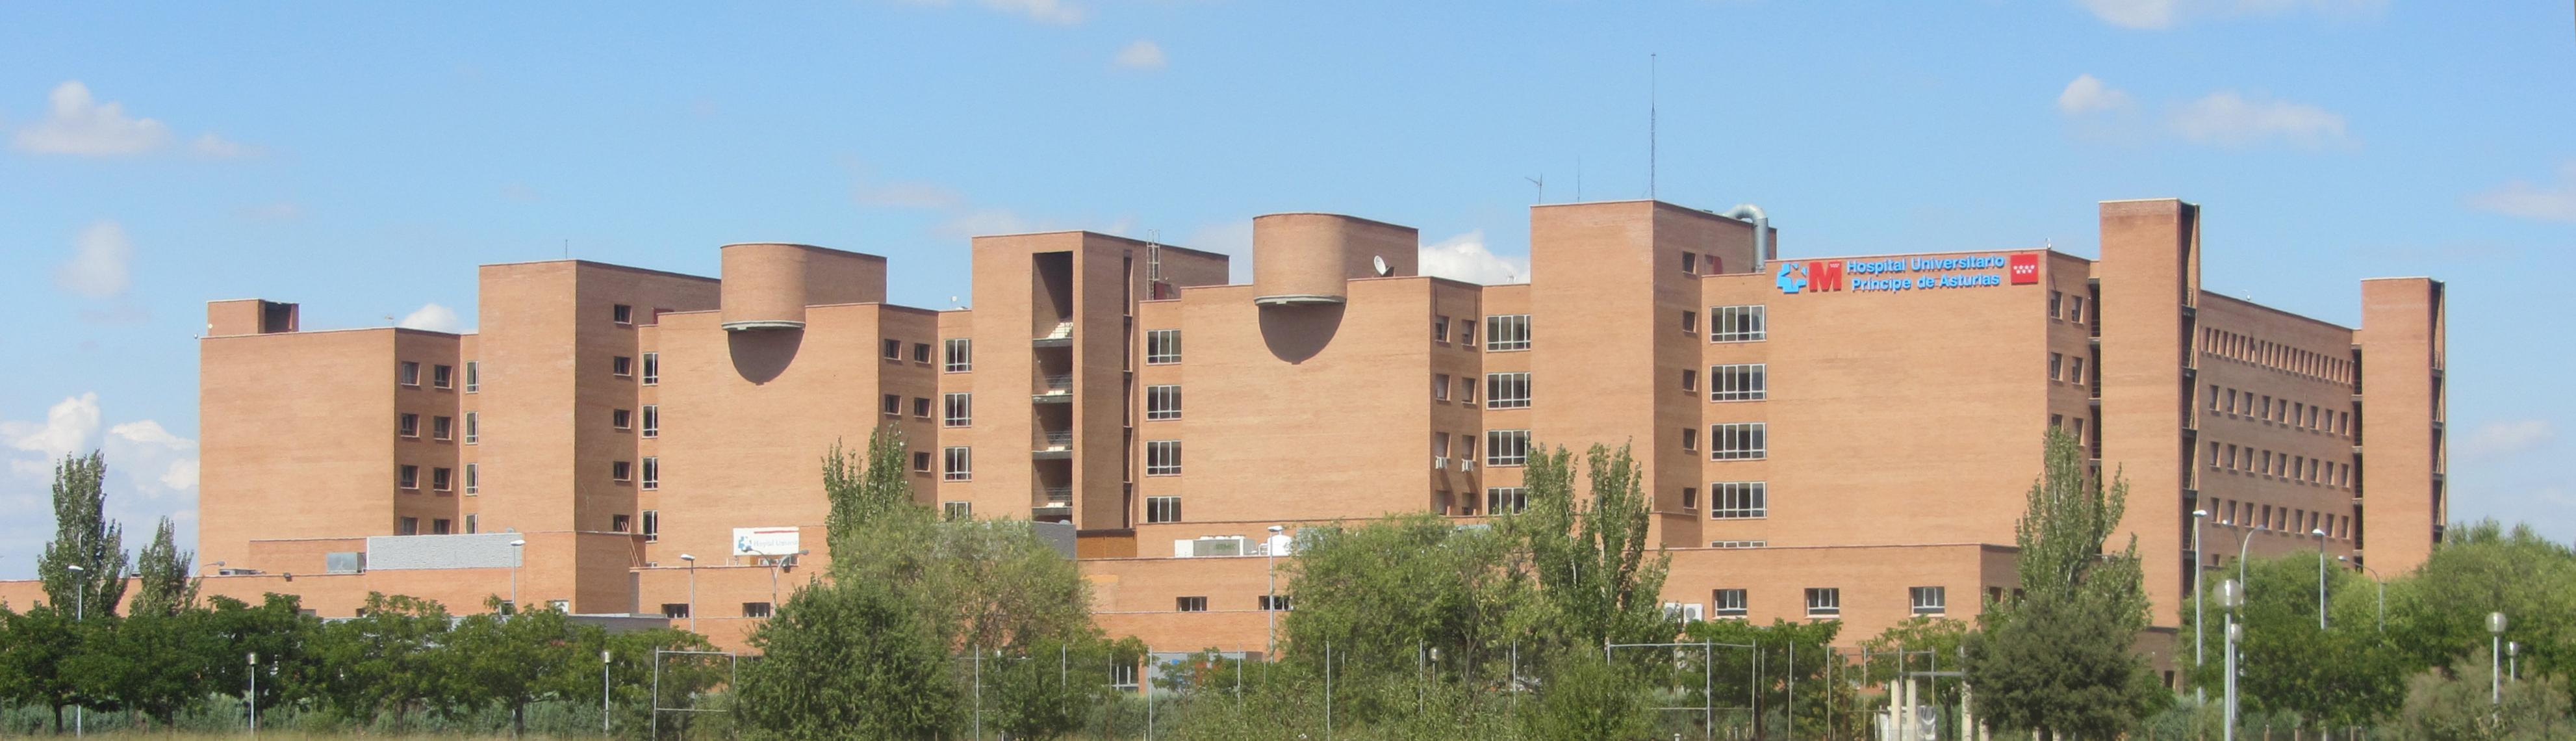 Depiction of Hospital universitario